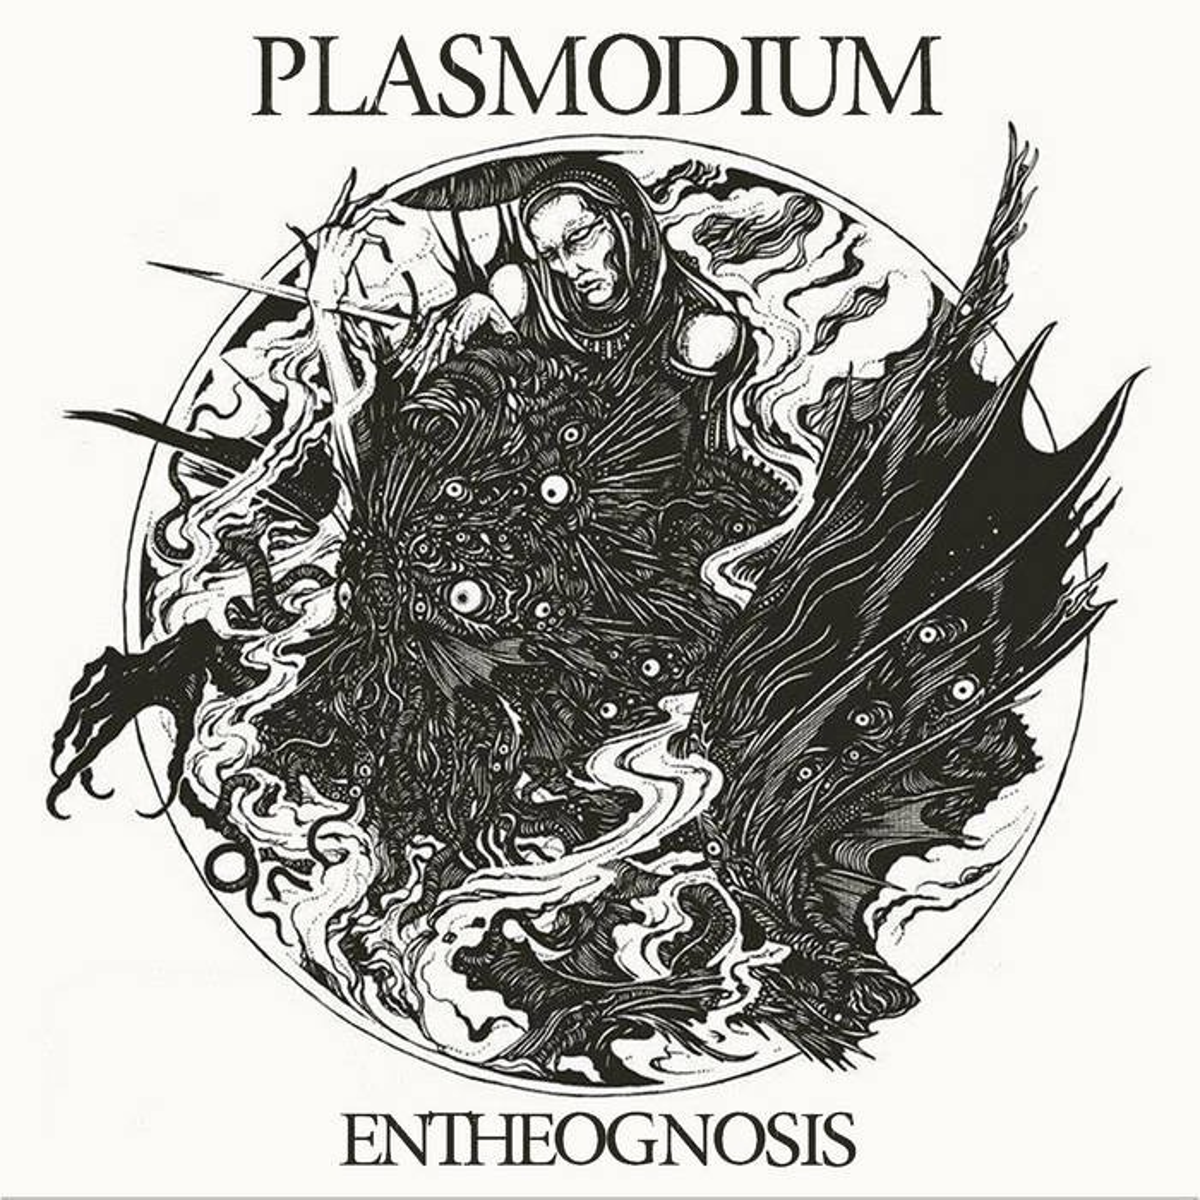 Reviews for Plasmodium - Entheognosis